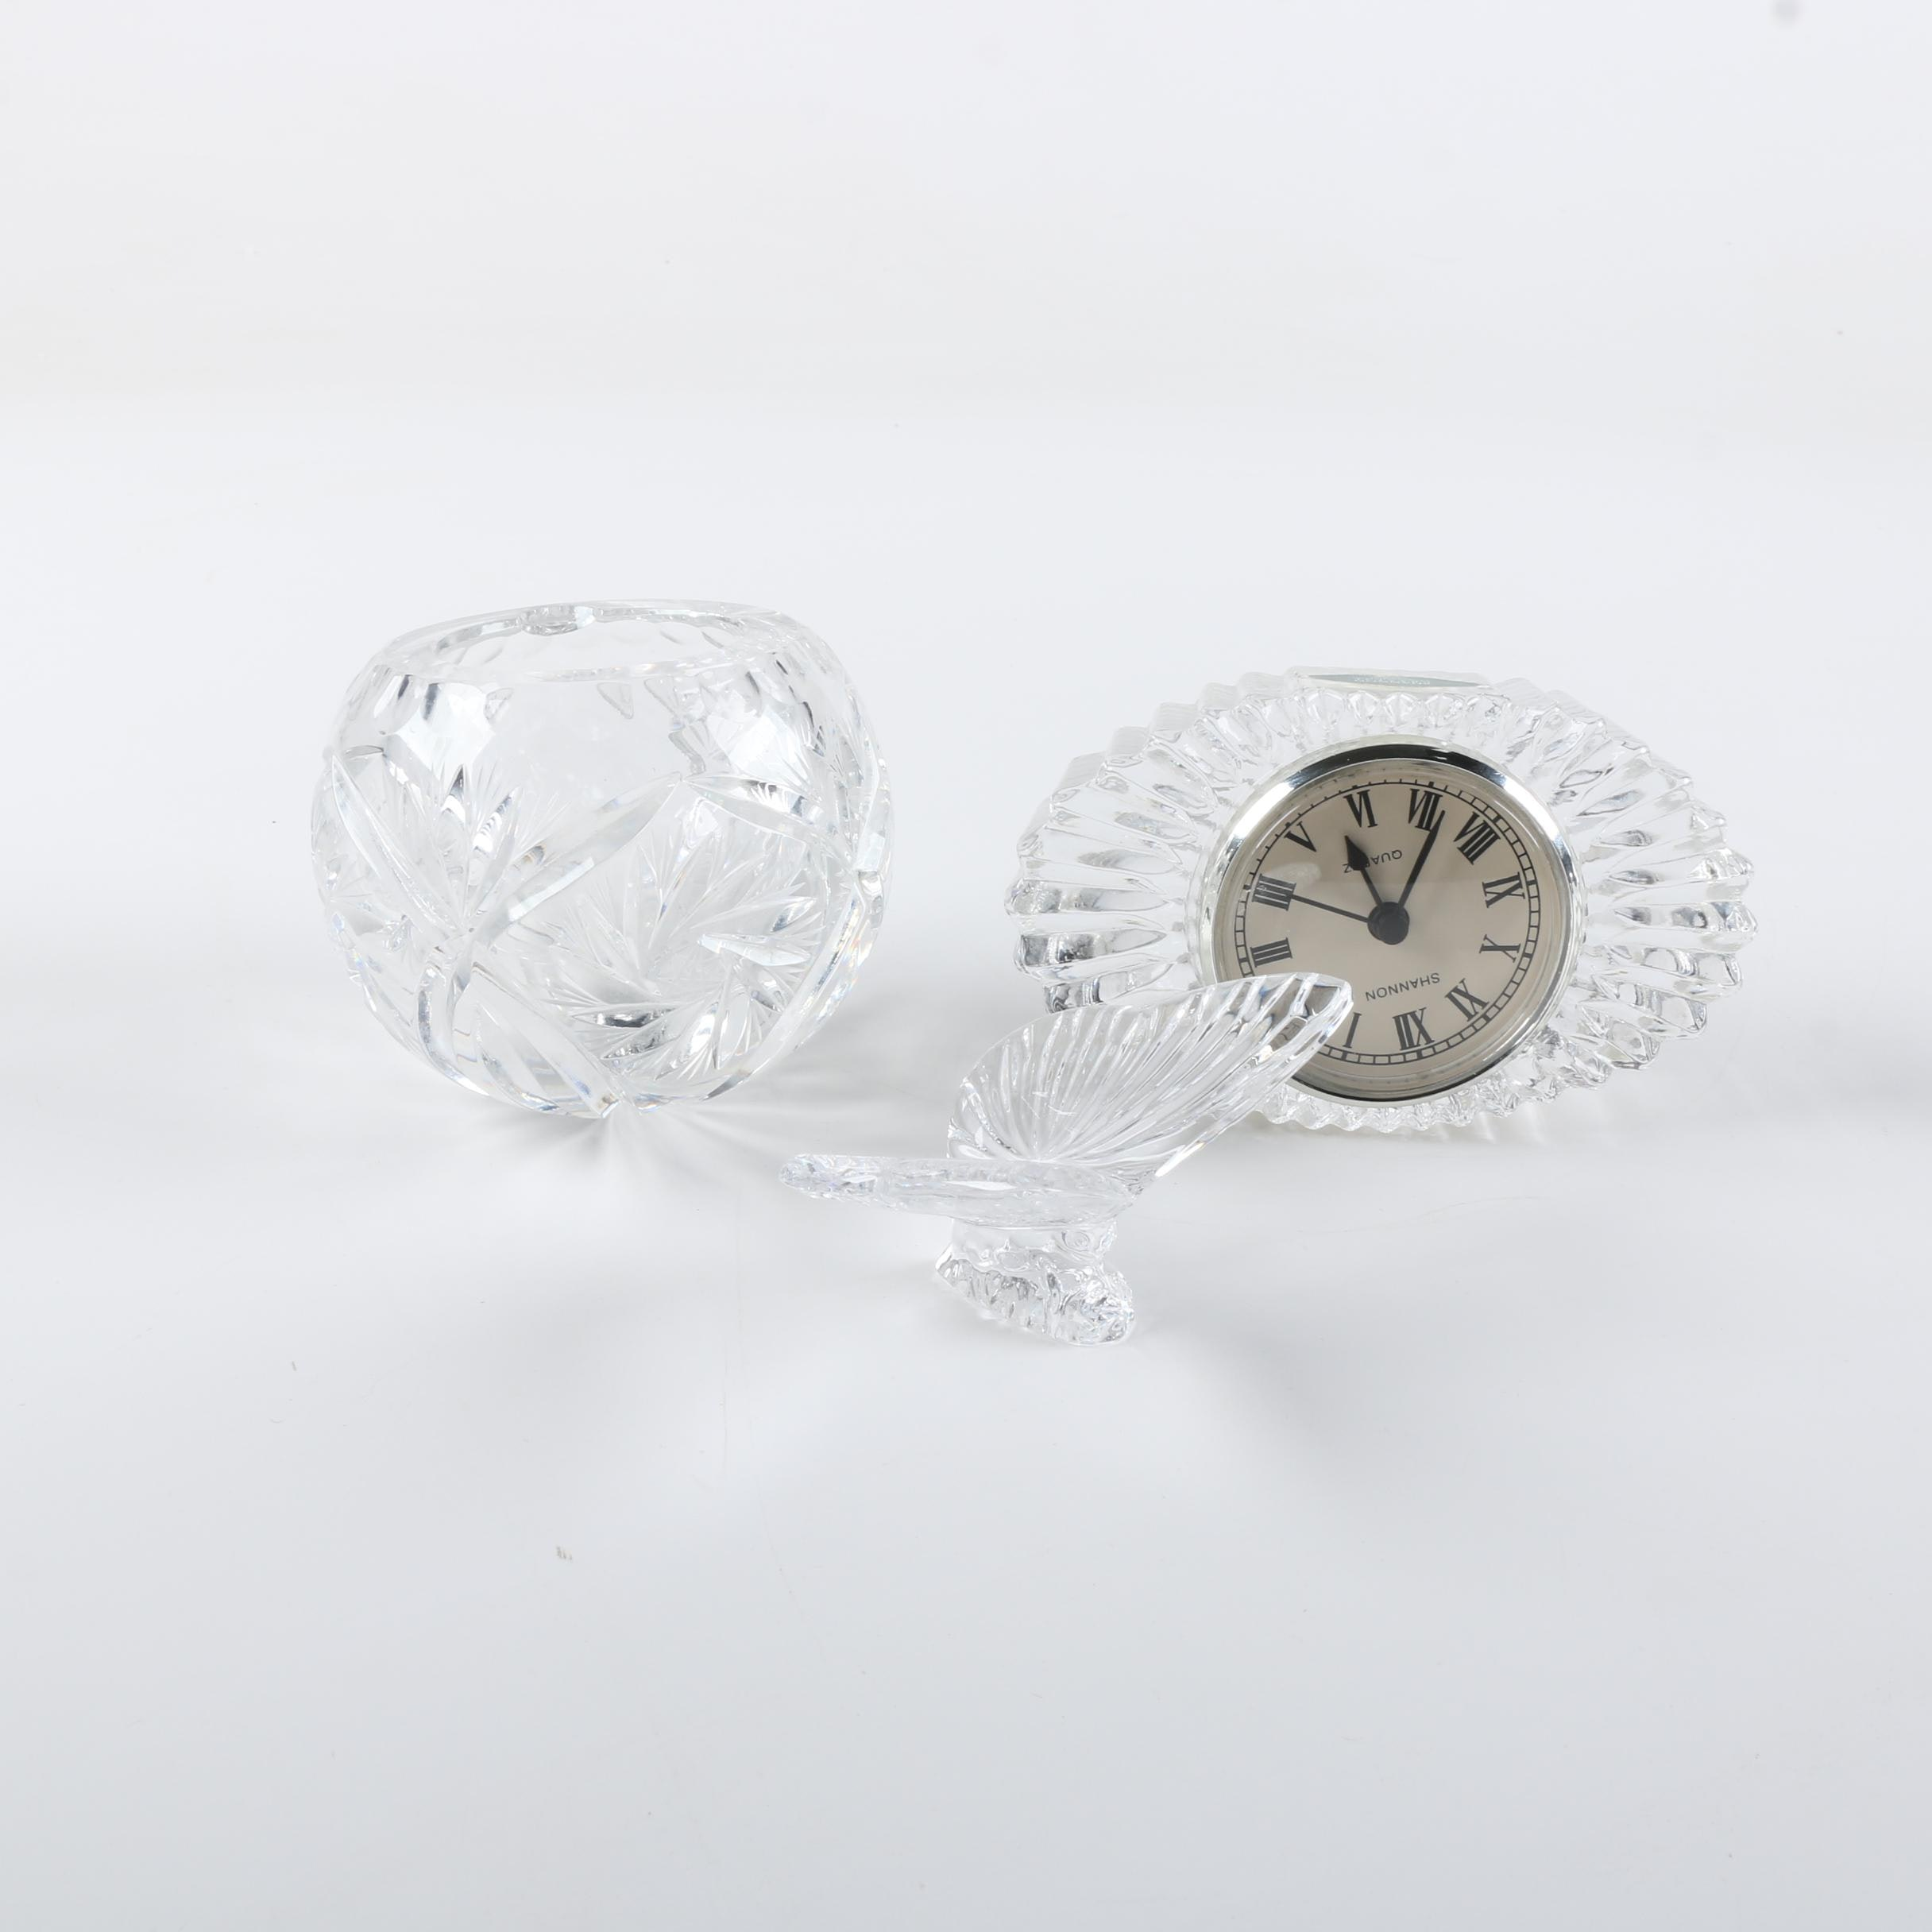 Crystal Decor Featuring Shannon Clock